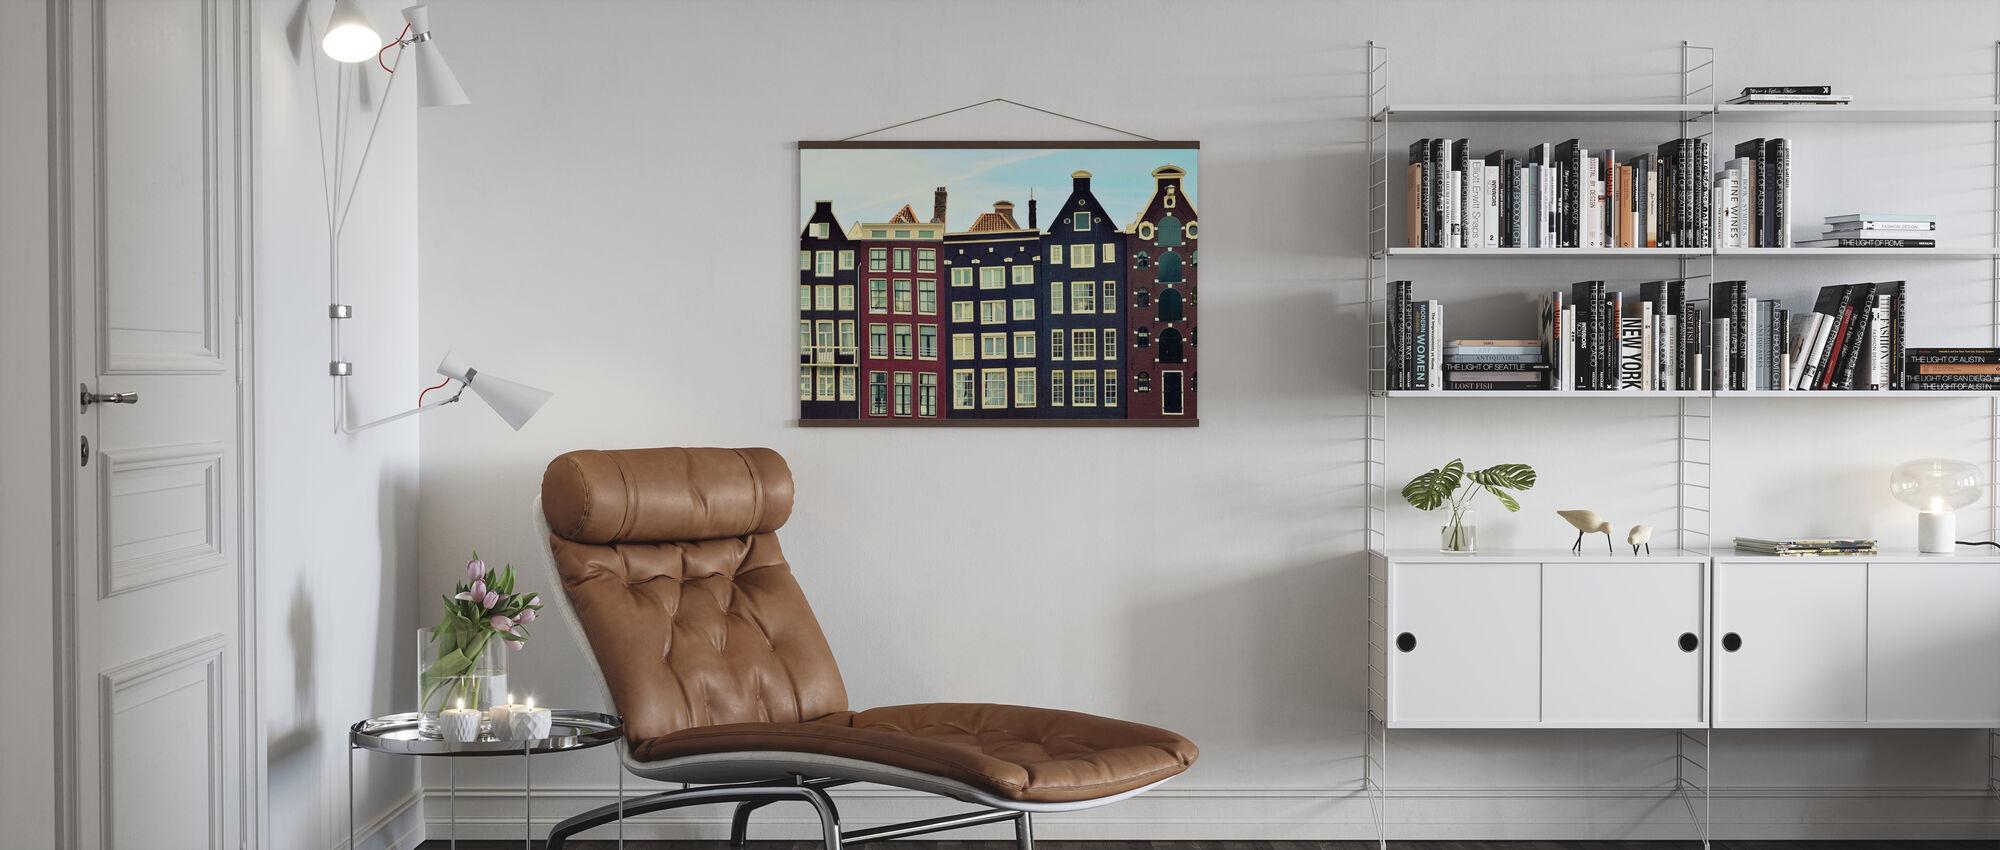 Amsterdam Hus - Plakat - Stue